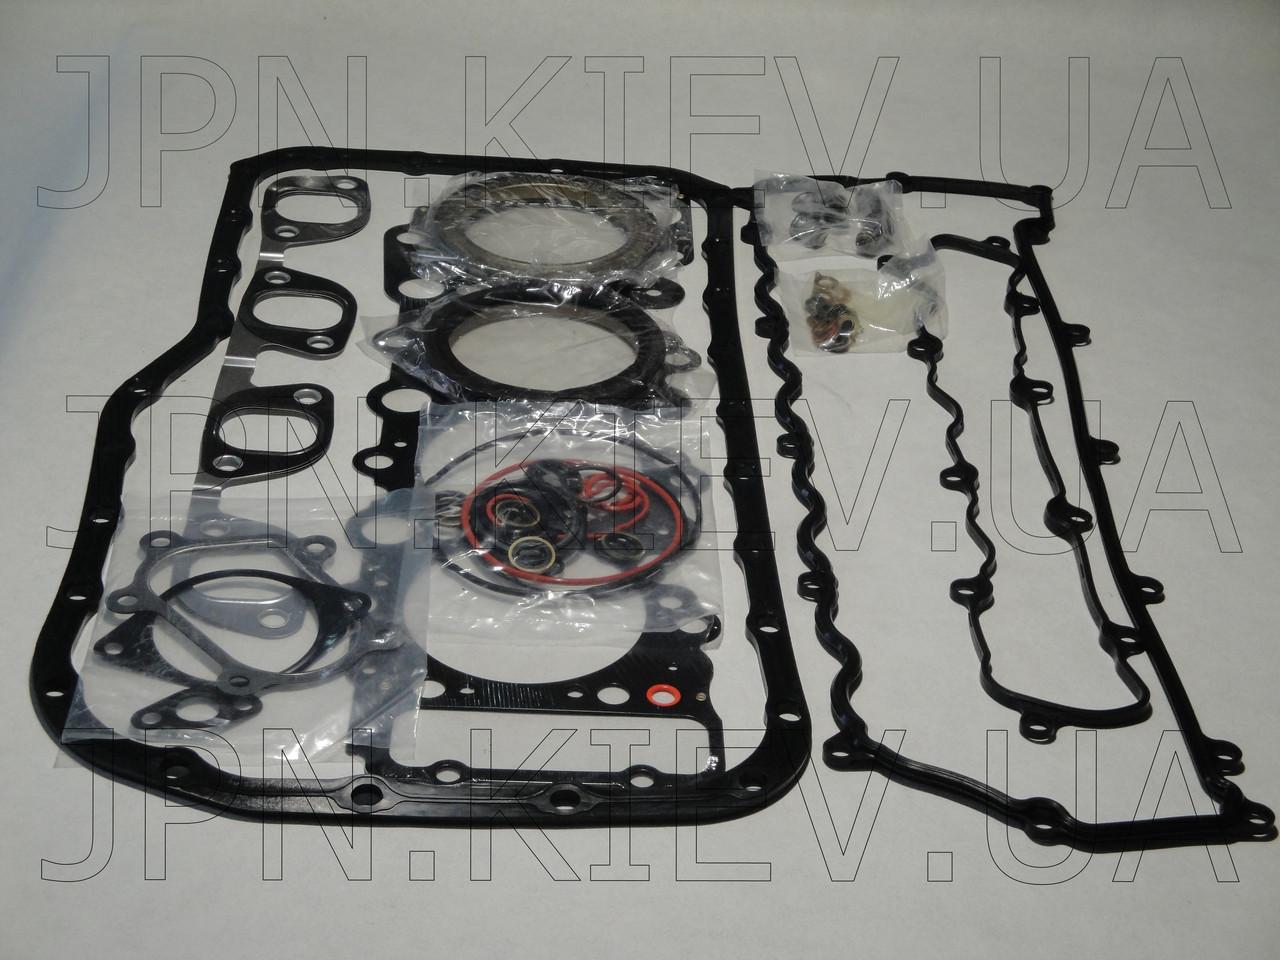 Набор прокладок двигателя (ISUZU 4HG1/4HG1-T) (5878143503/5878143496/5878139540/ 5878143494/EF8580) TEIKIN